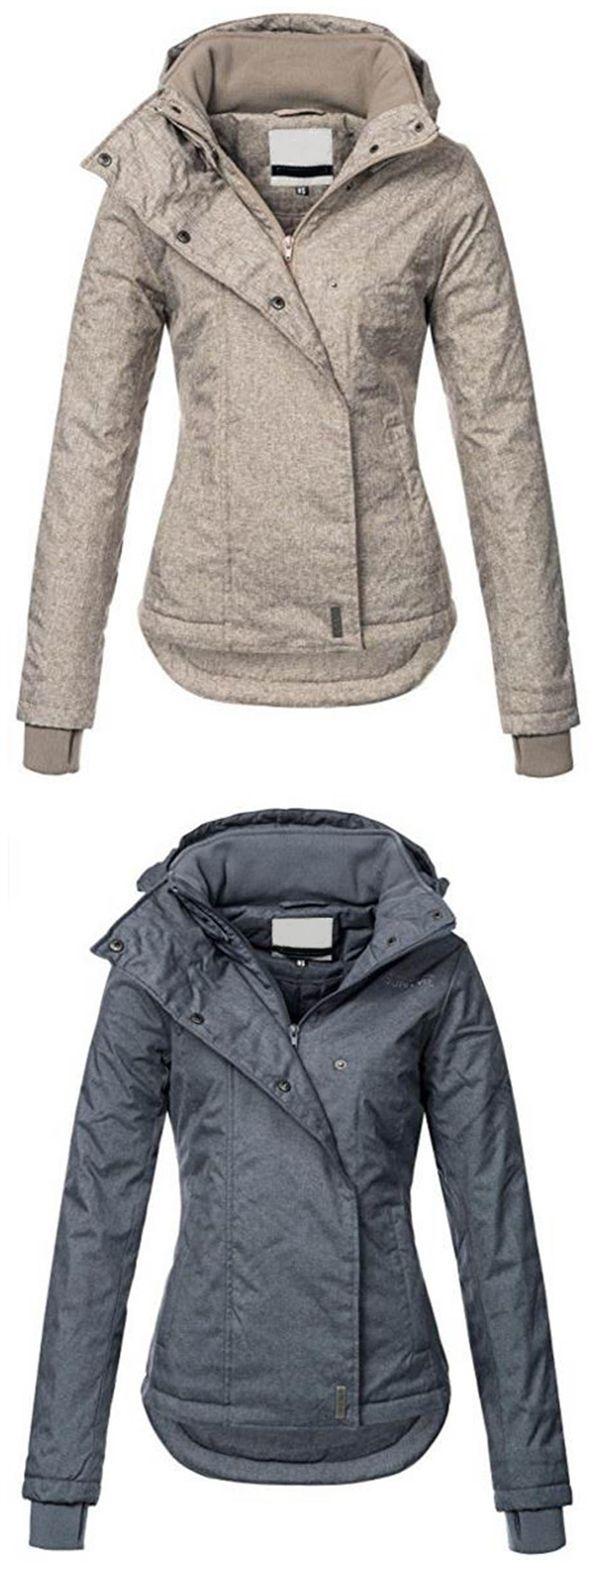 Ericdress Slim Plain Zipper Hooded Jacket